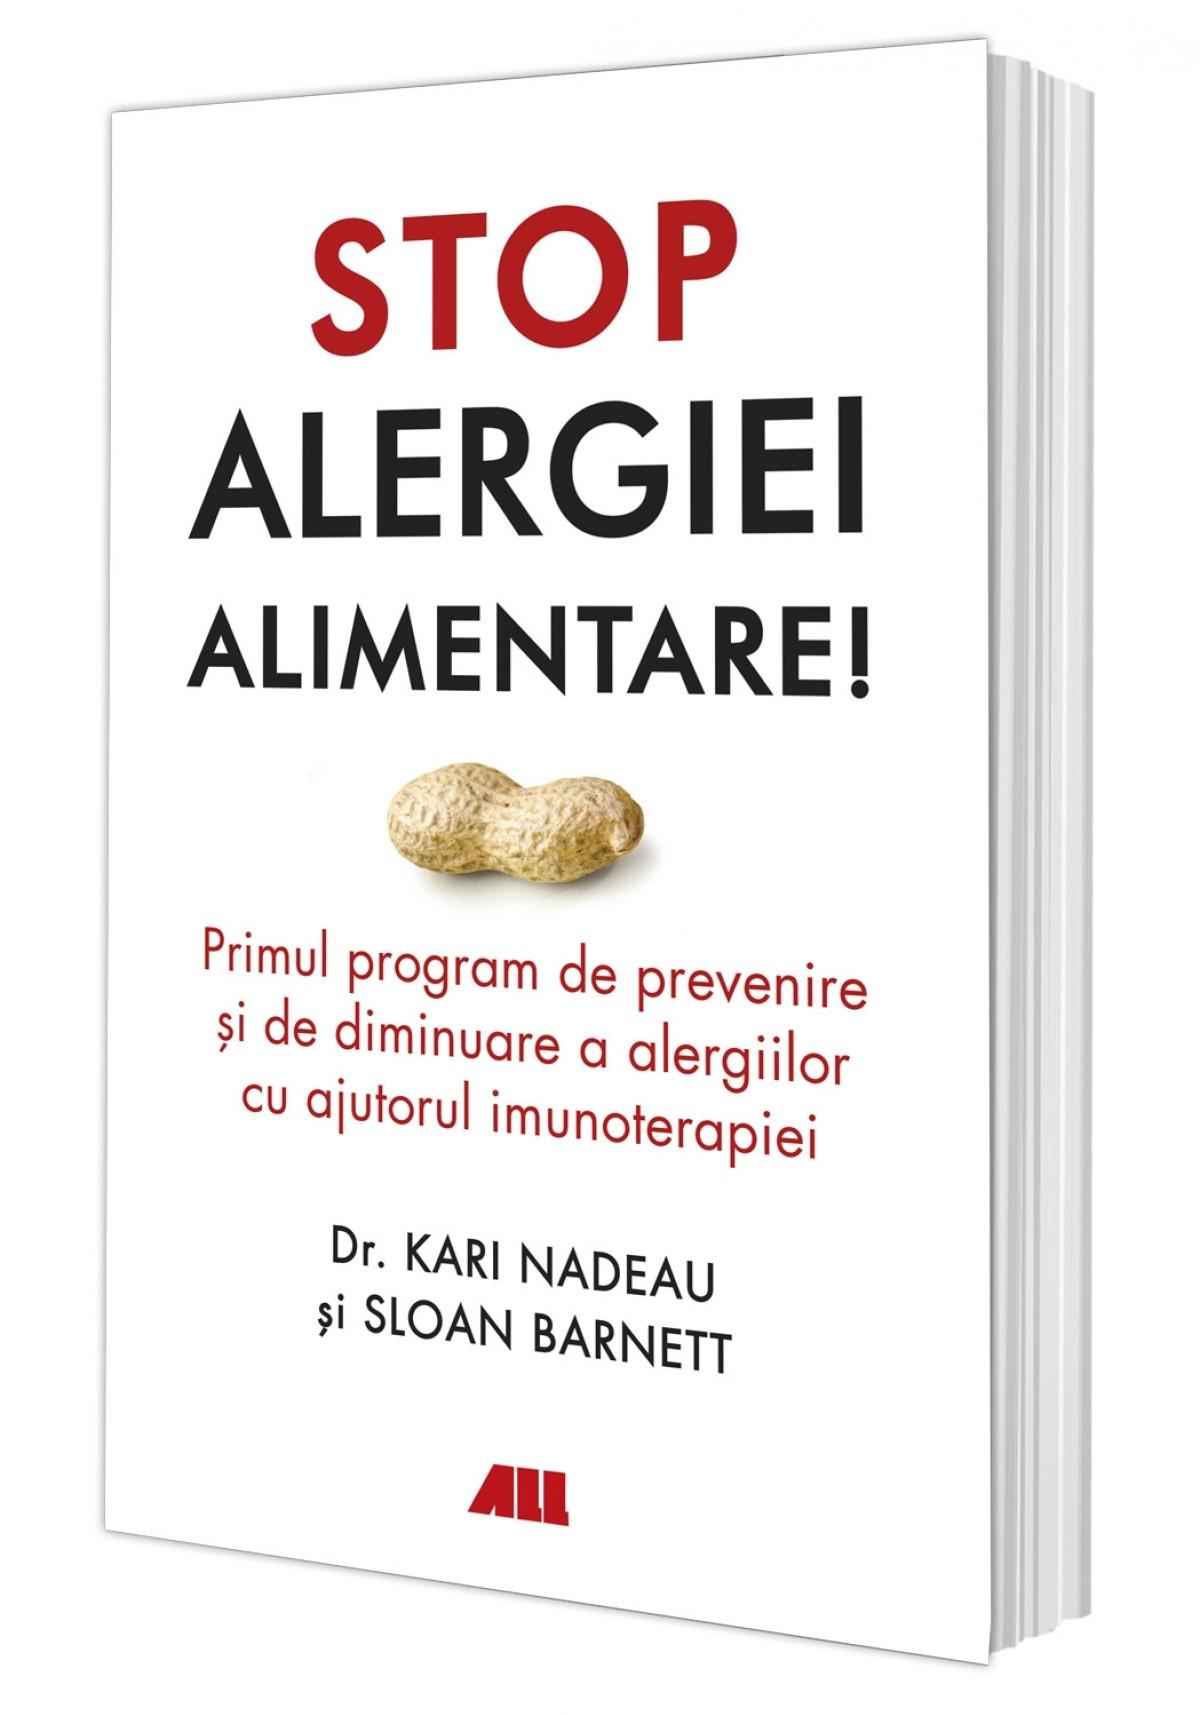 Stop alergiei alimentare!